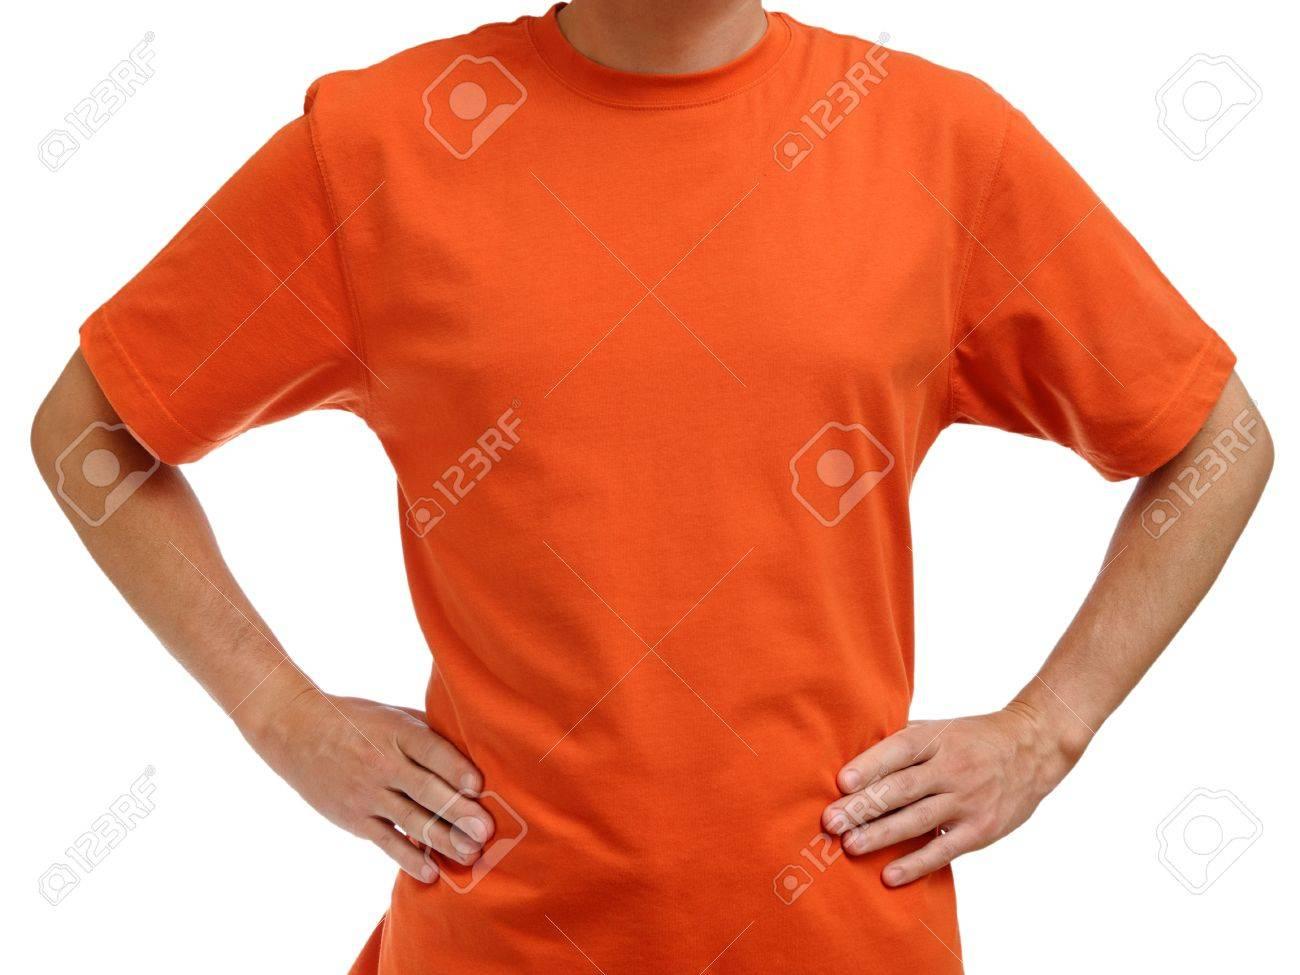 Orange t-shirt on young man isolated on white background - 10479224